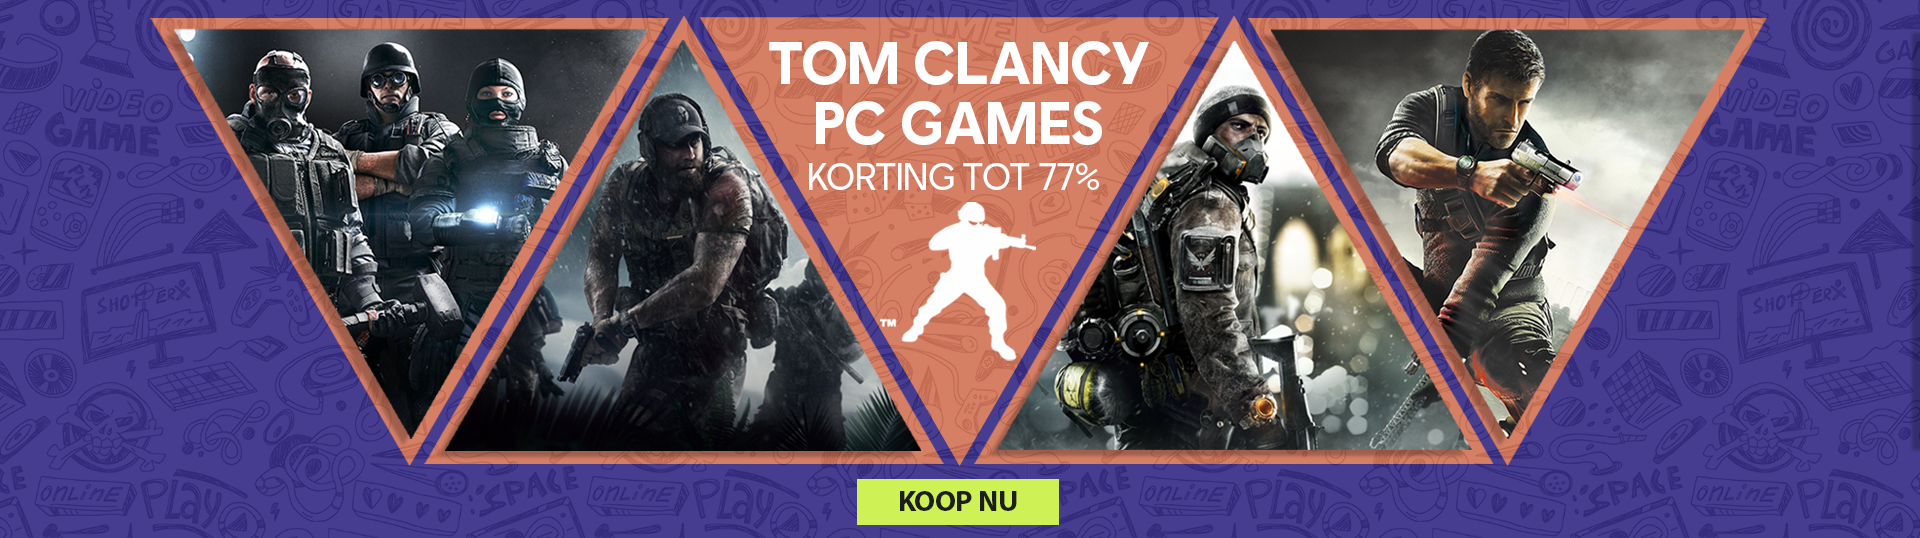 Diverse Tom Clancy games tot 77% korting